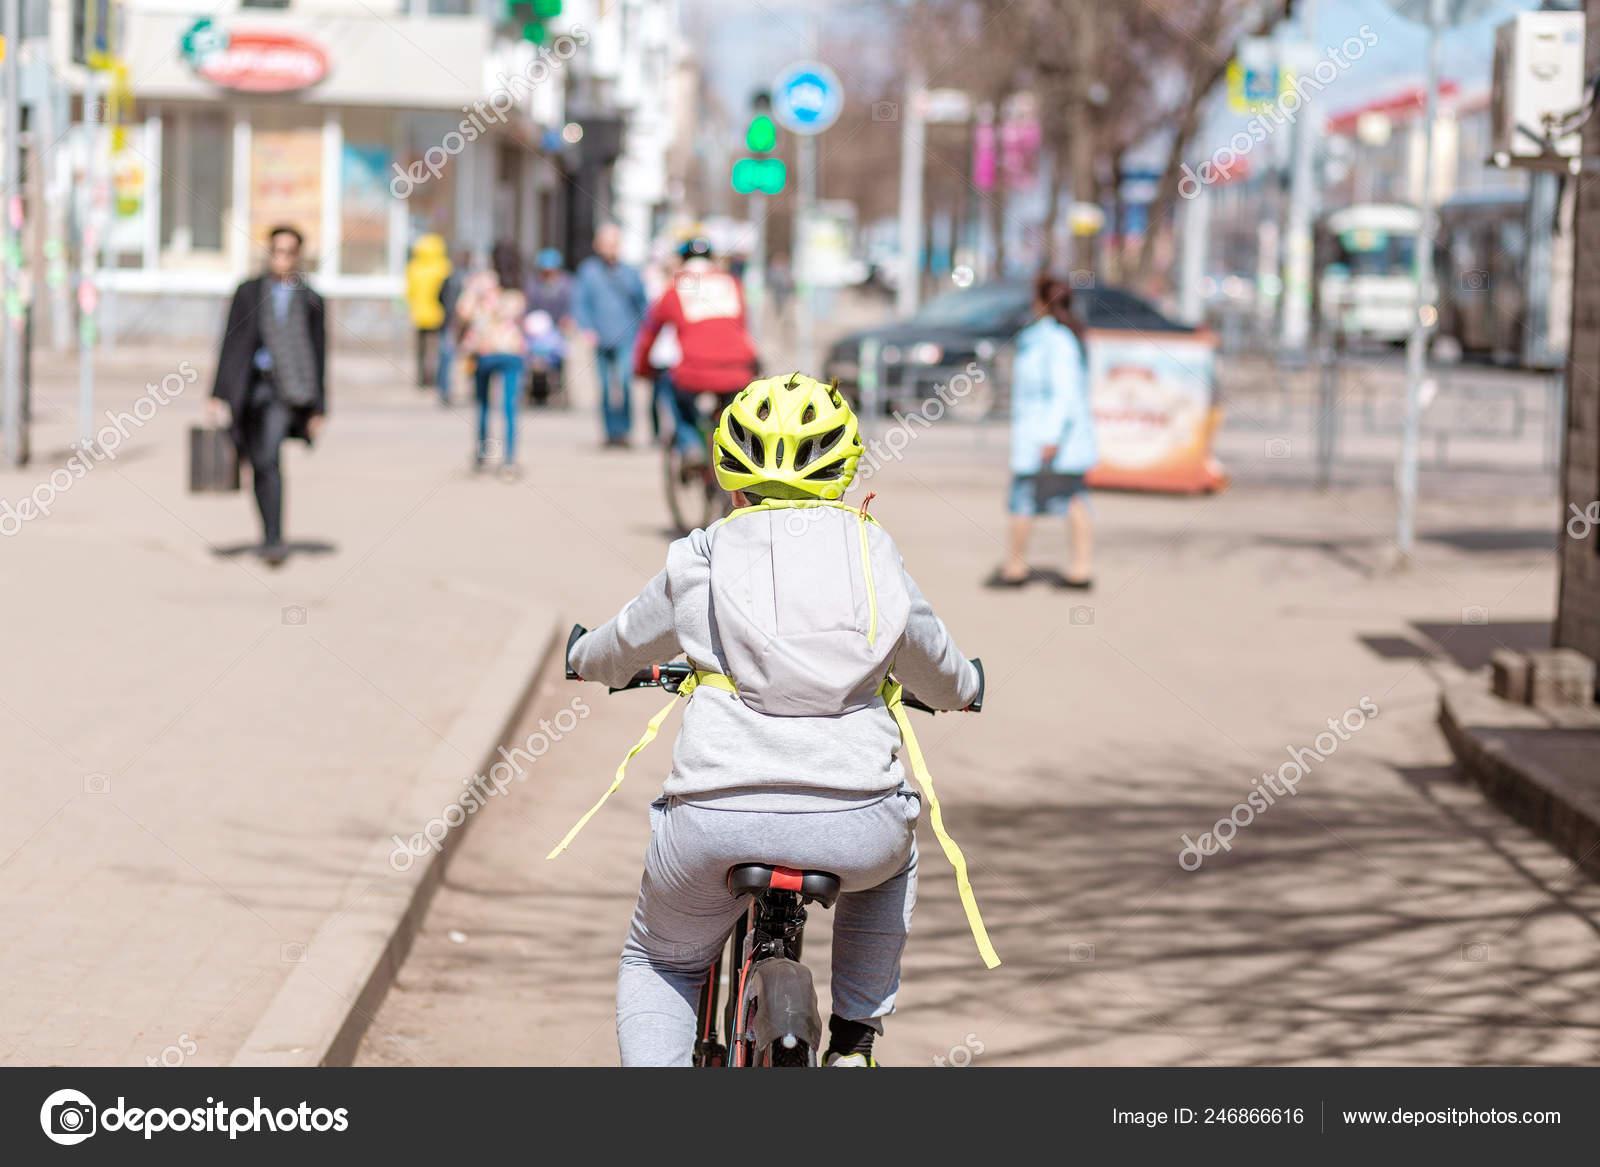 Child Boy Helmet Riding Cycle Path City Street Stock Photo C Frantic00 246866616